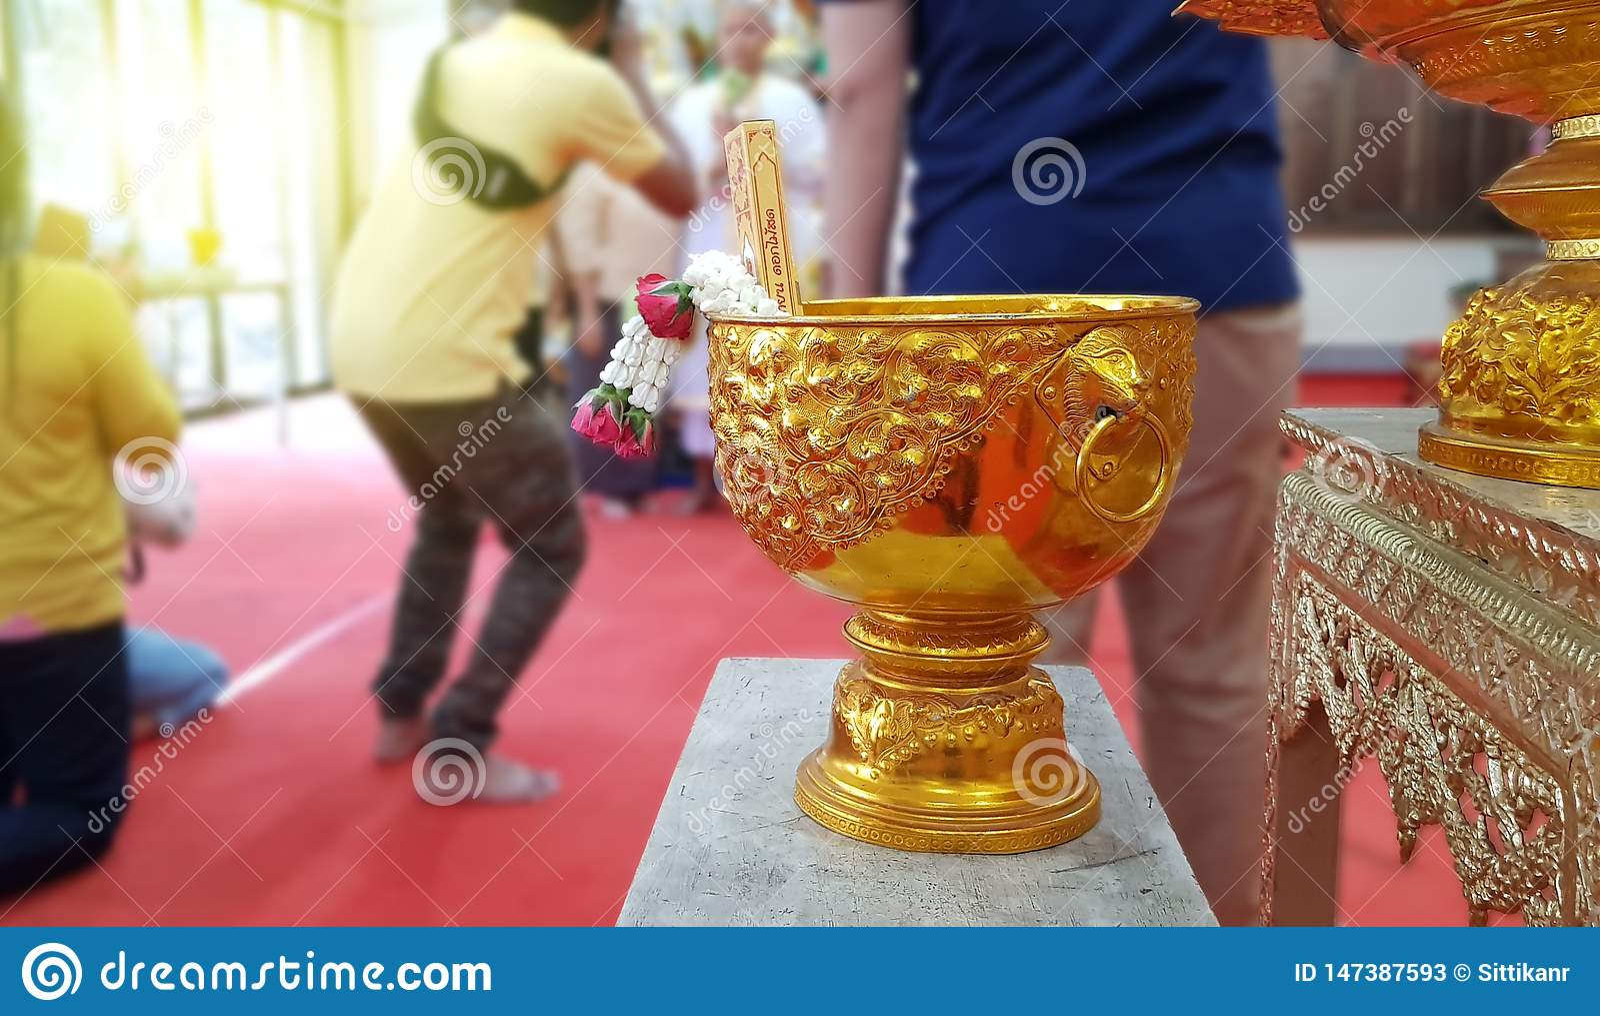 Thaise waterkom op vage achtergrond, Thaise Ordeningsceremonie, Thaise Cultuur voor de Elke Mens die een Nieuwe Monnik of een Pri